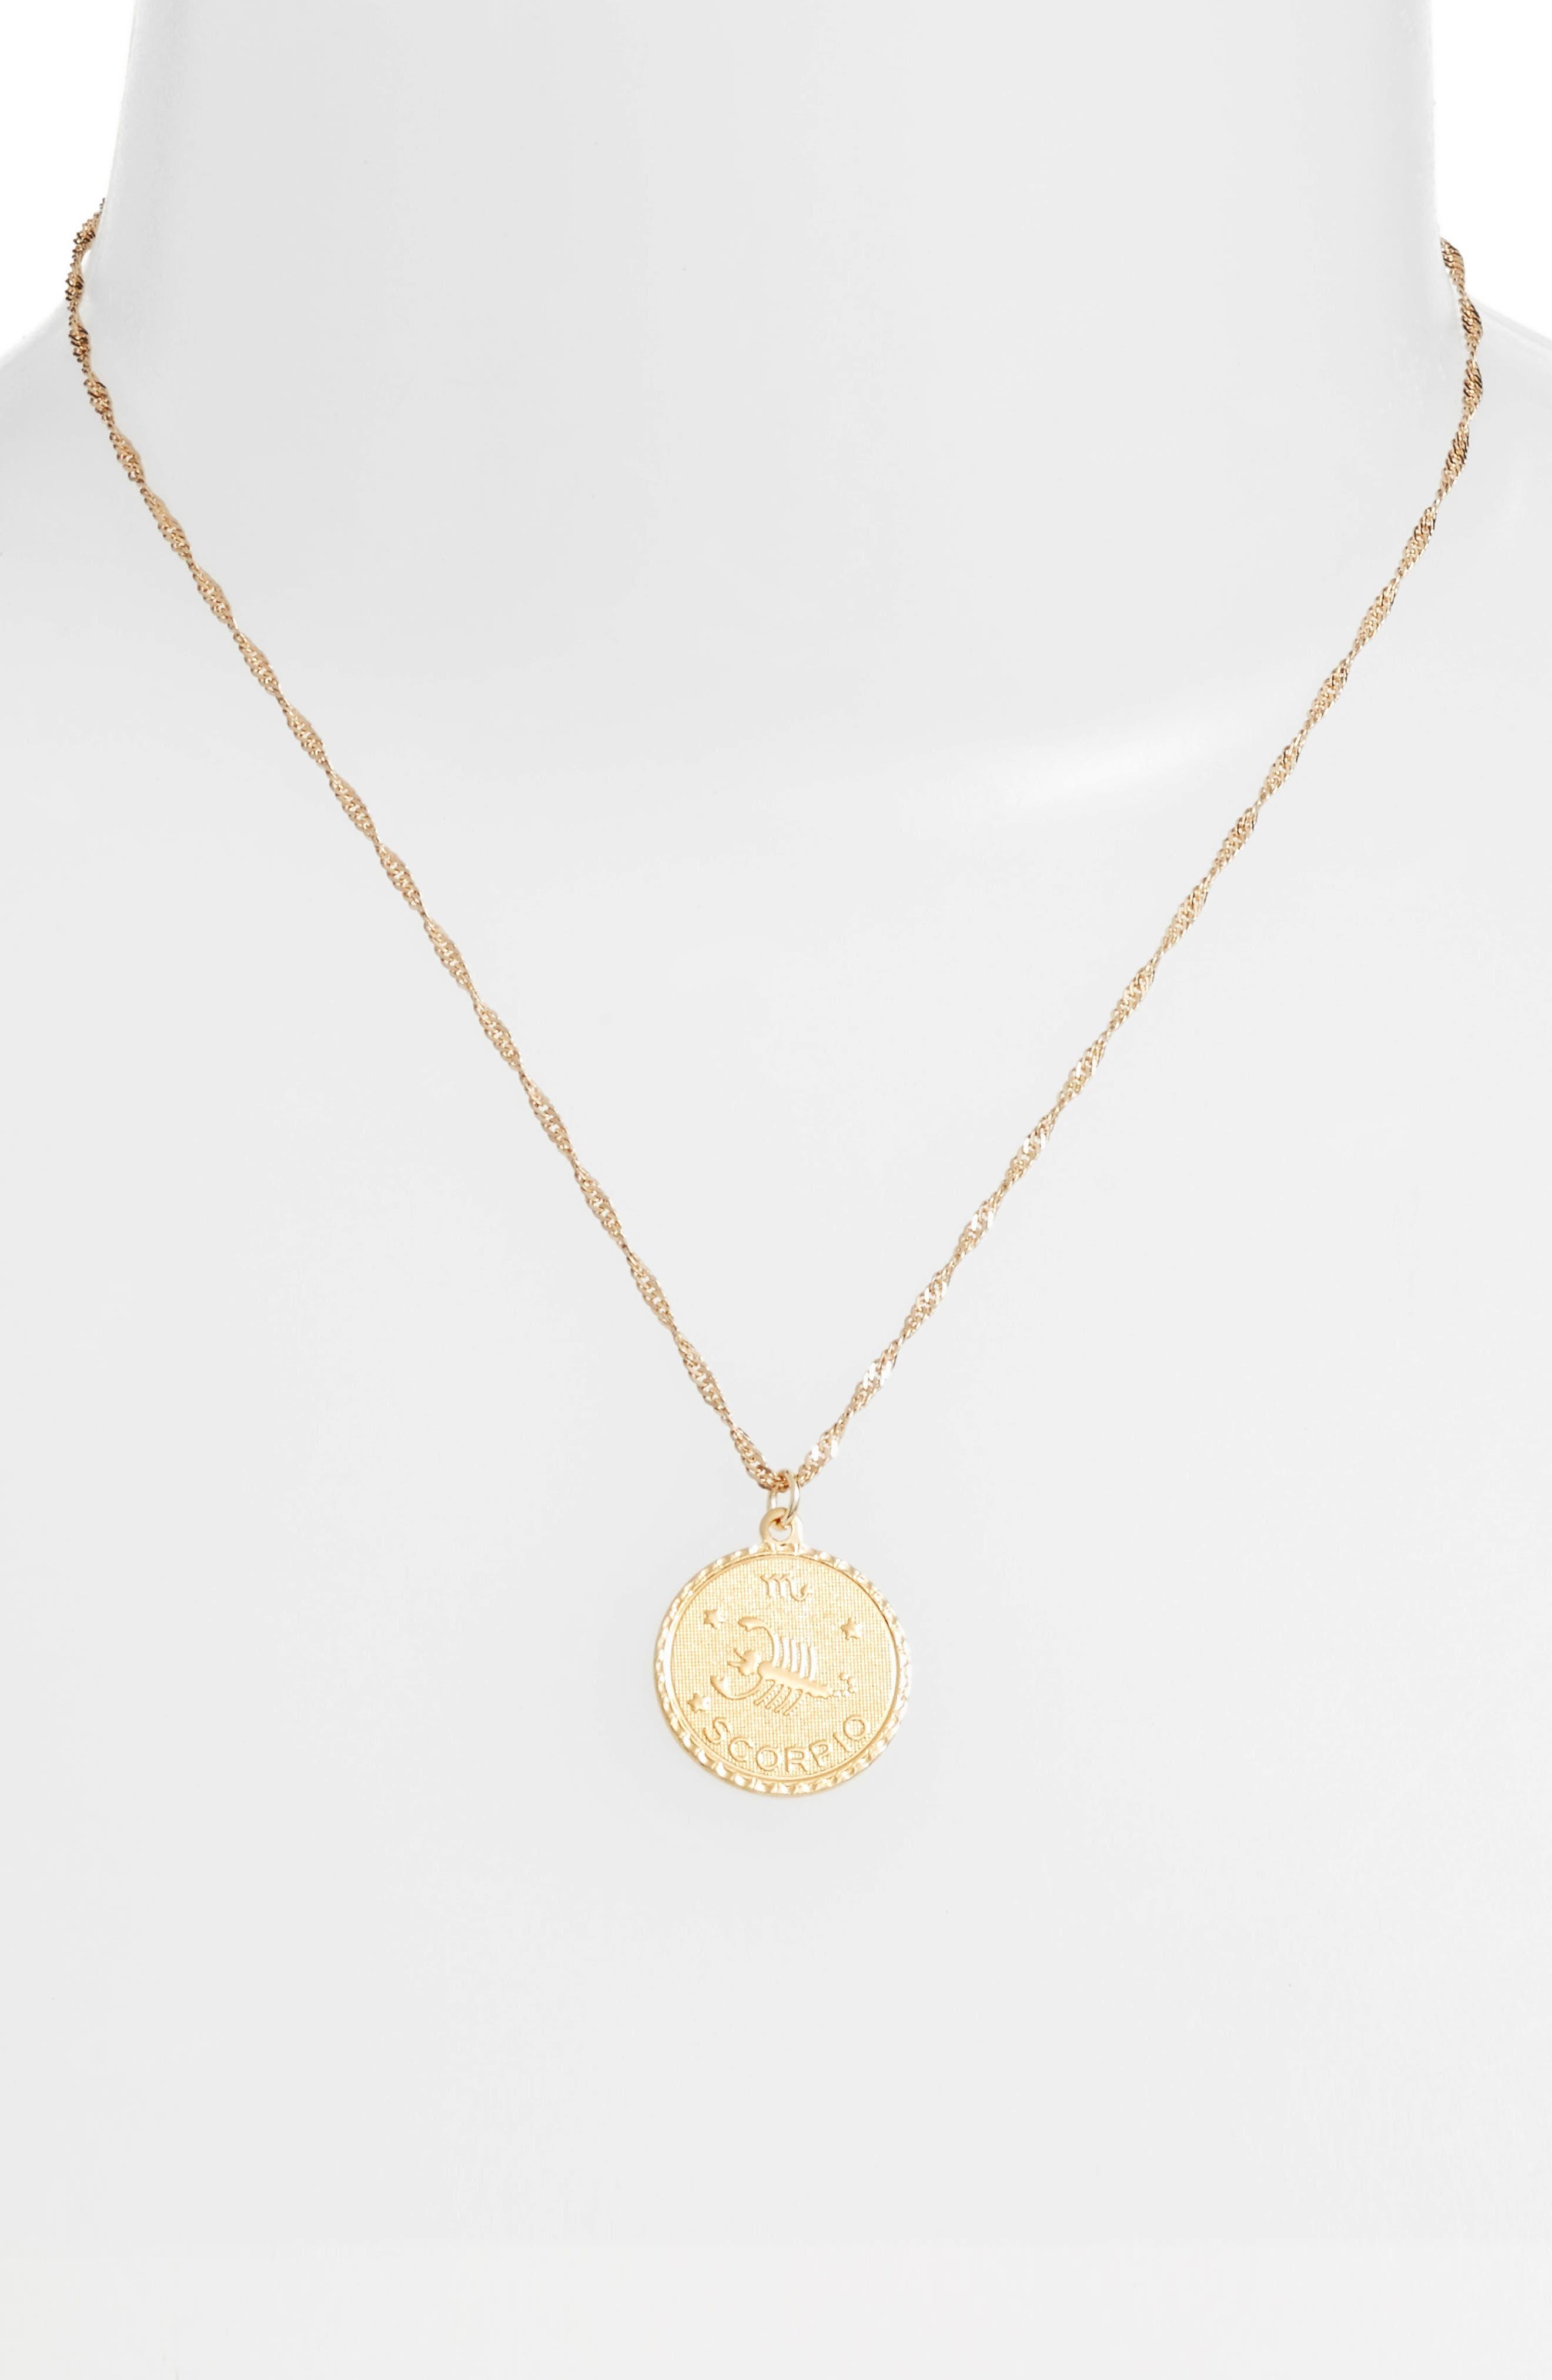 Jewelry Ascending Zodiac Medallion Necklace,                             Alternate thumbnail 2, color,                             Scorpio